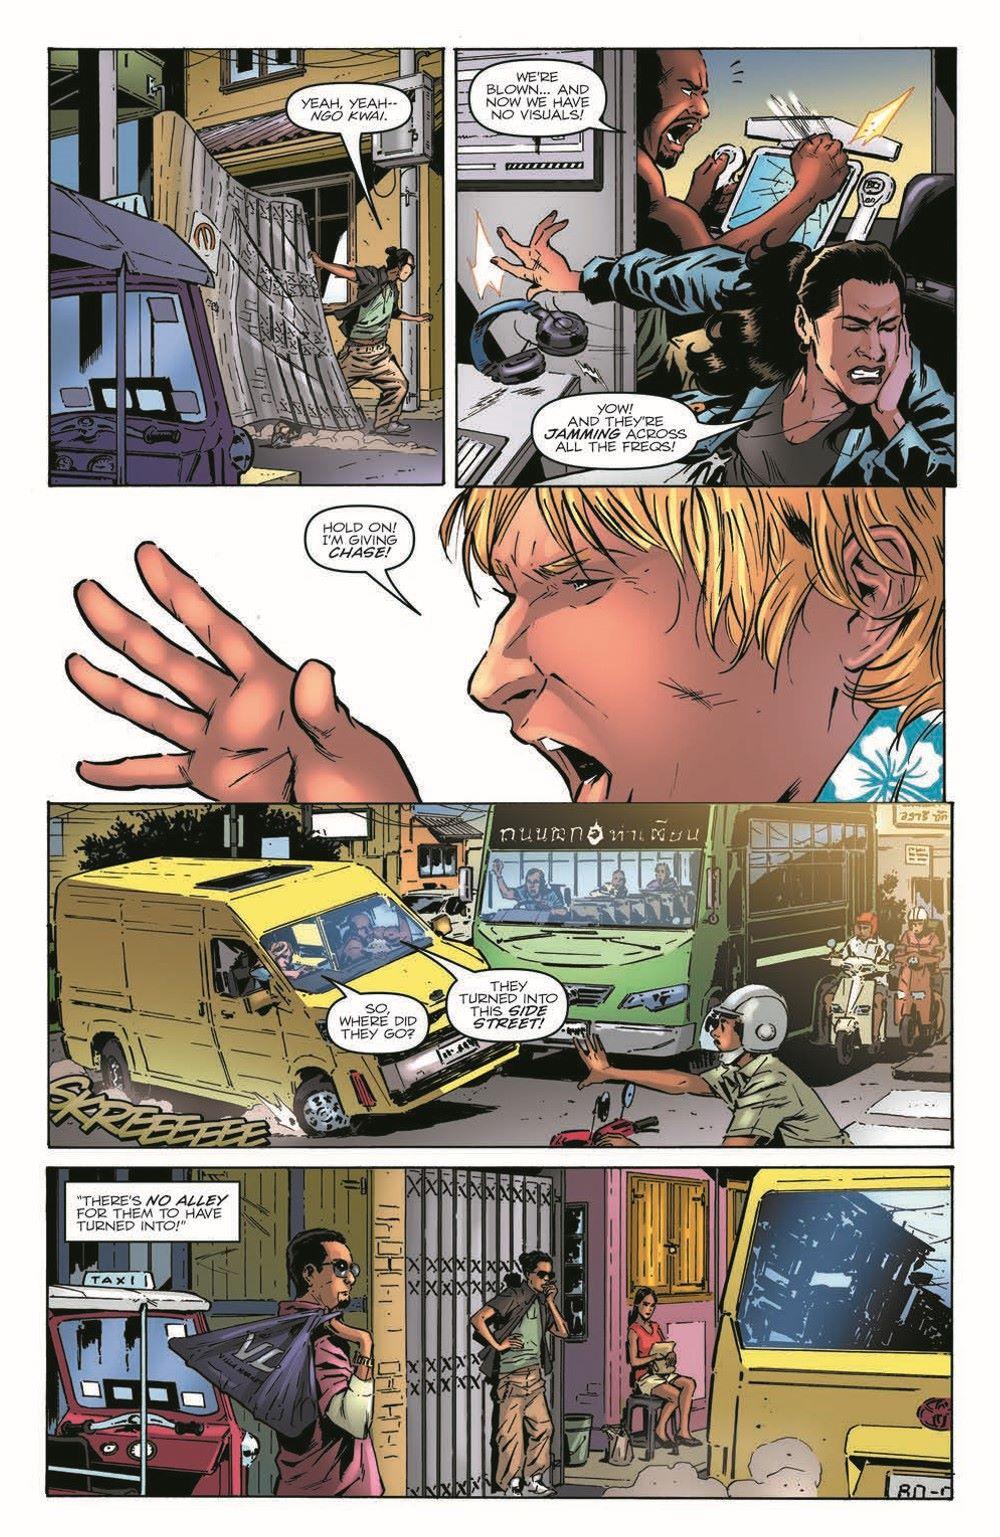 GIJoeRAH283-pr-5 ComicList Previews: G.I. JOE A REAL AMERICAN HERO #283